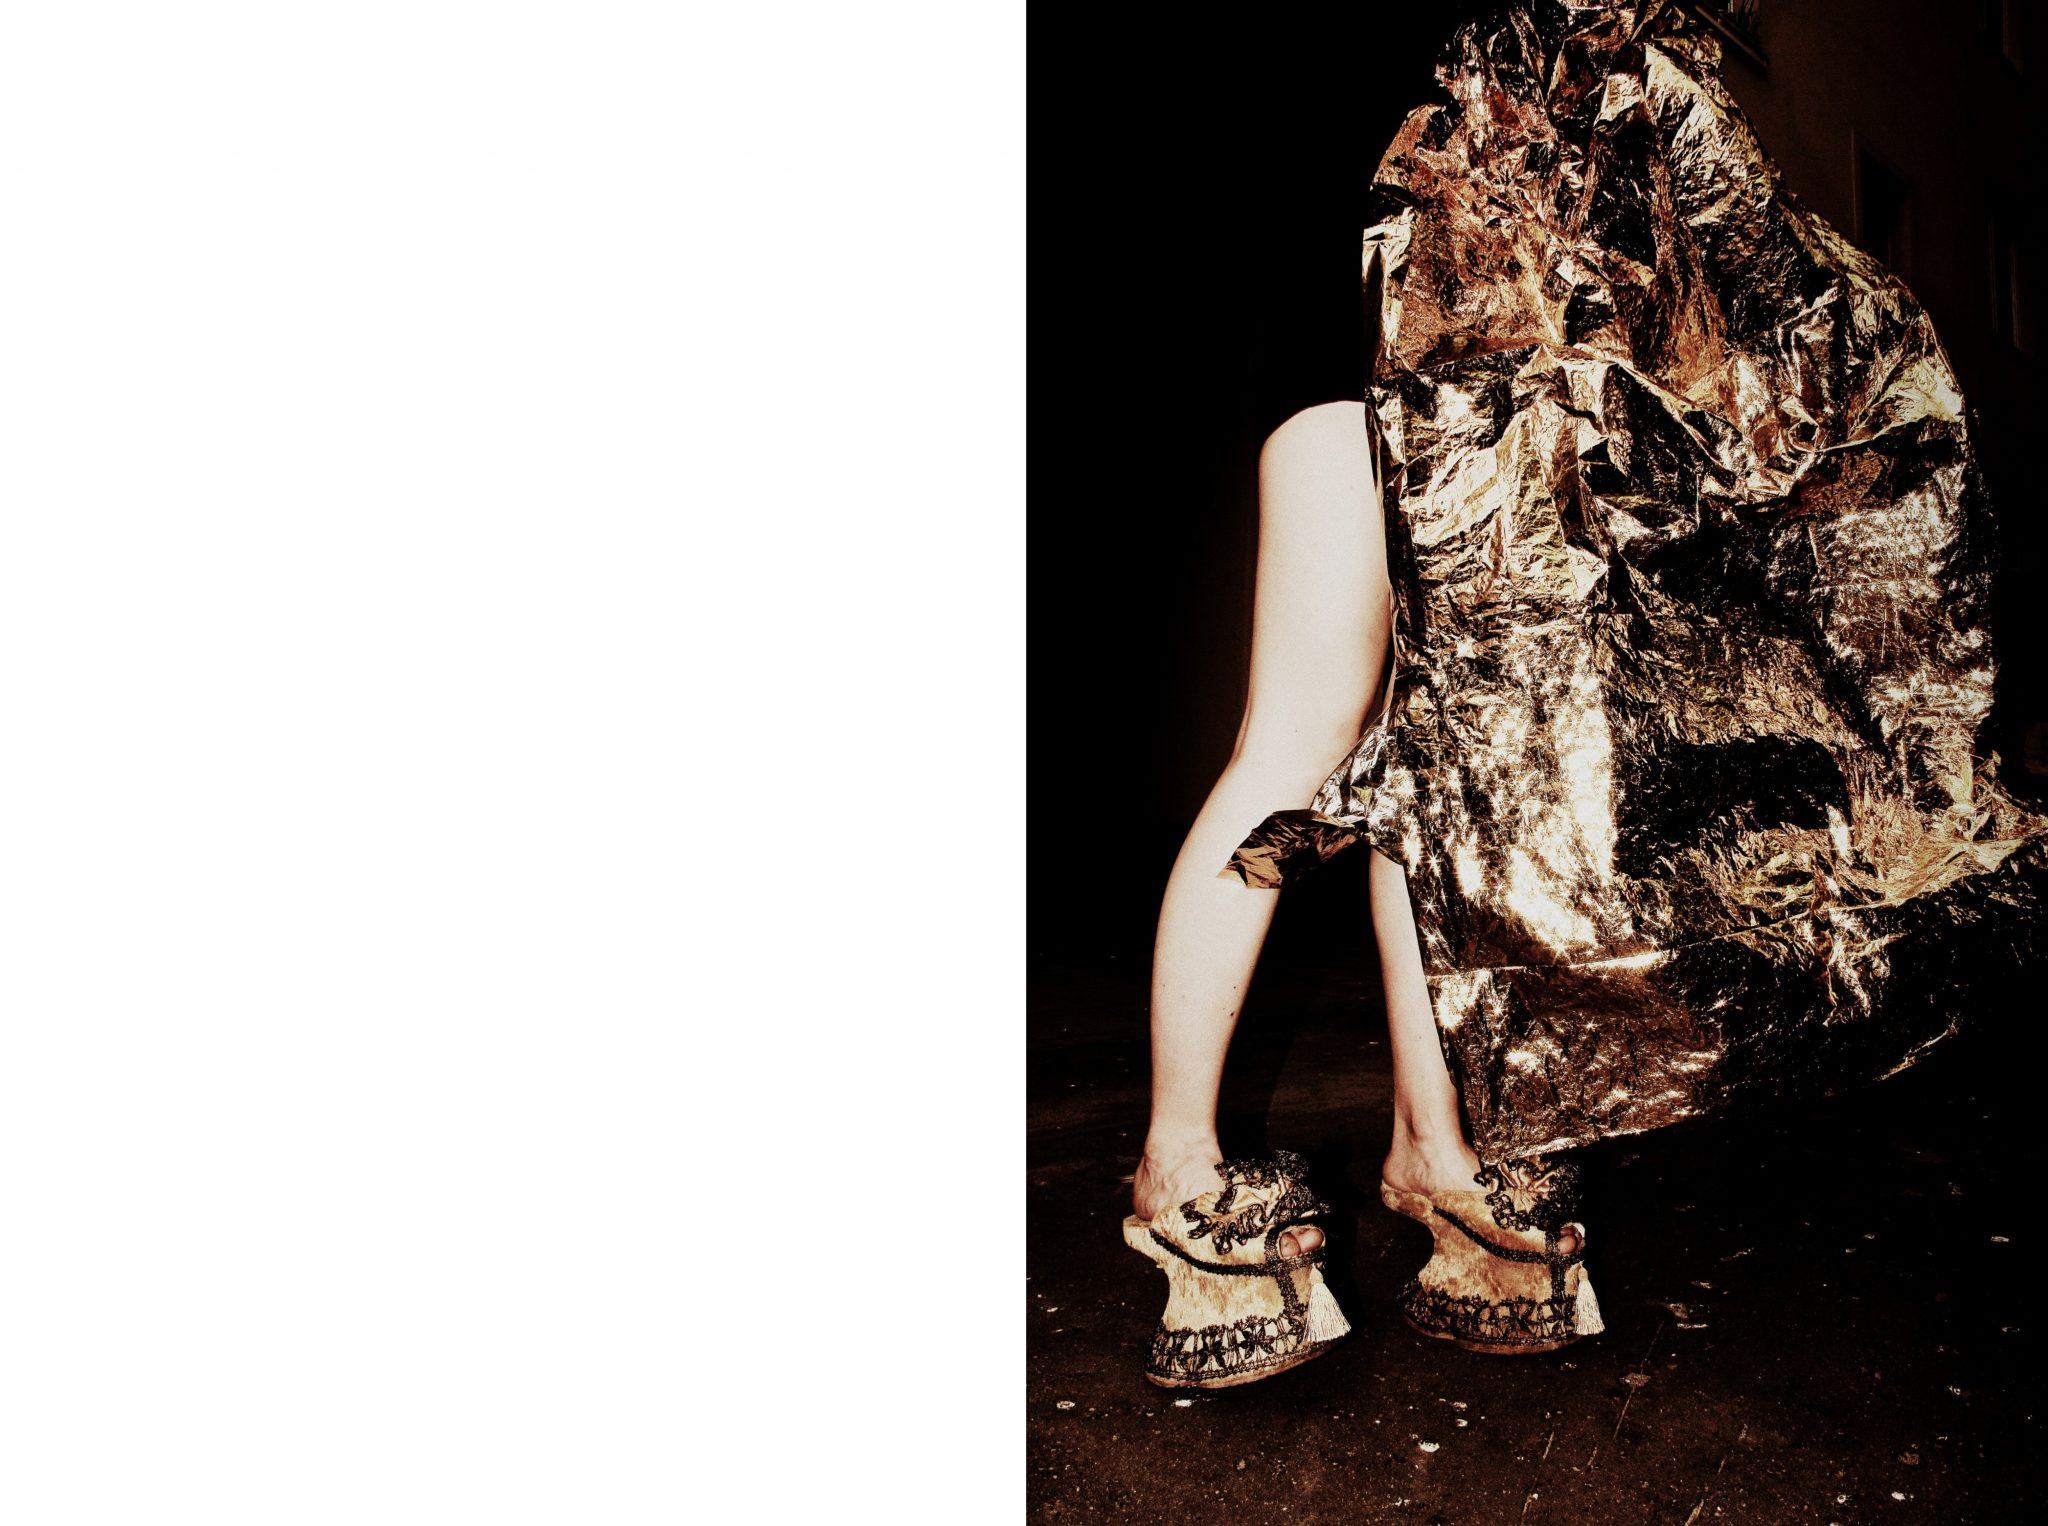 Natalia Lis photographer photographe fashion editorial story vanity le dernier etage magazine